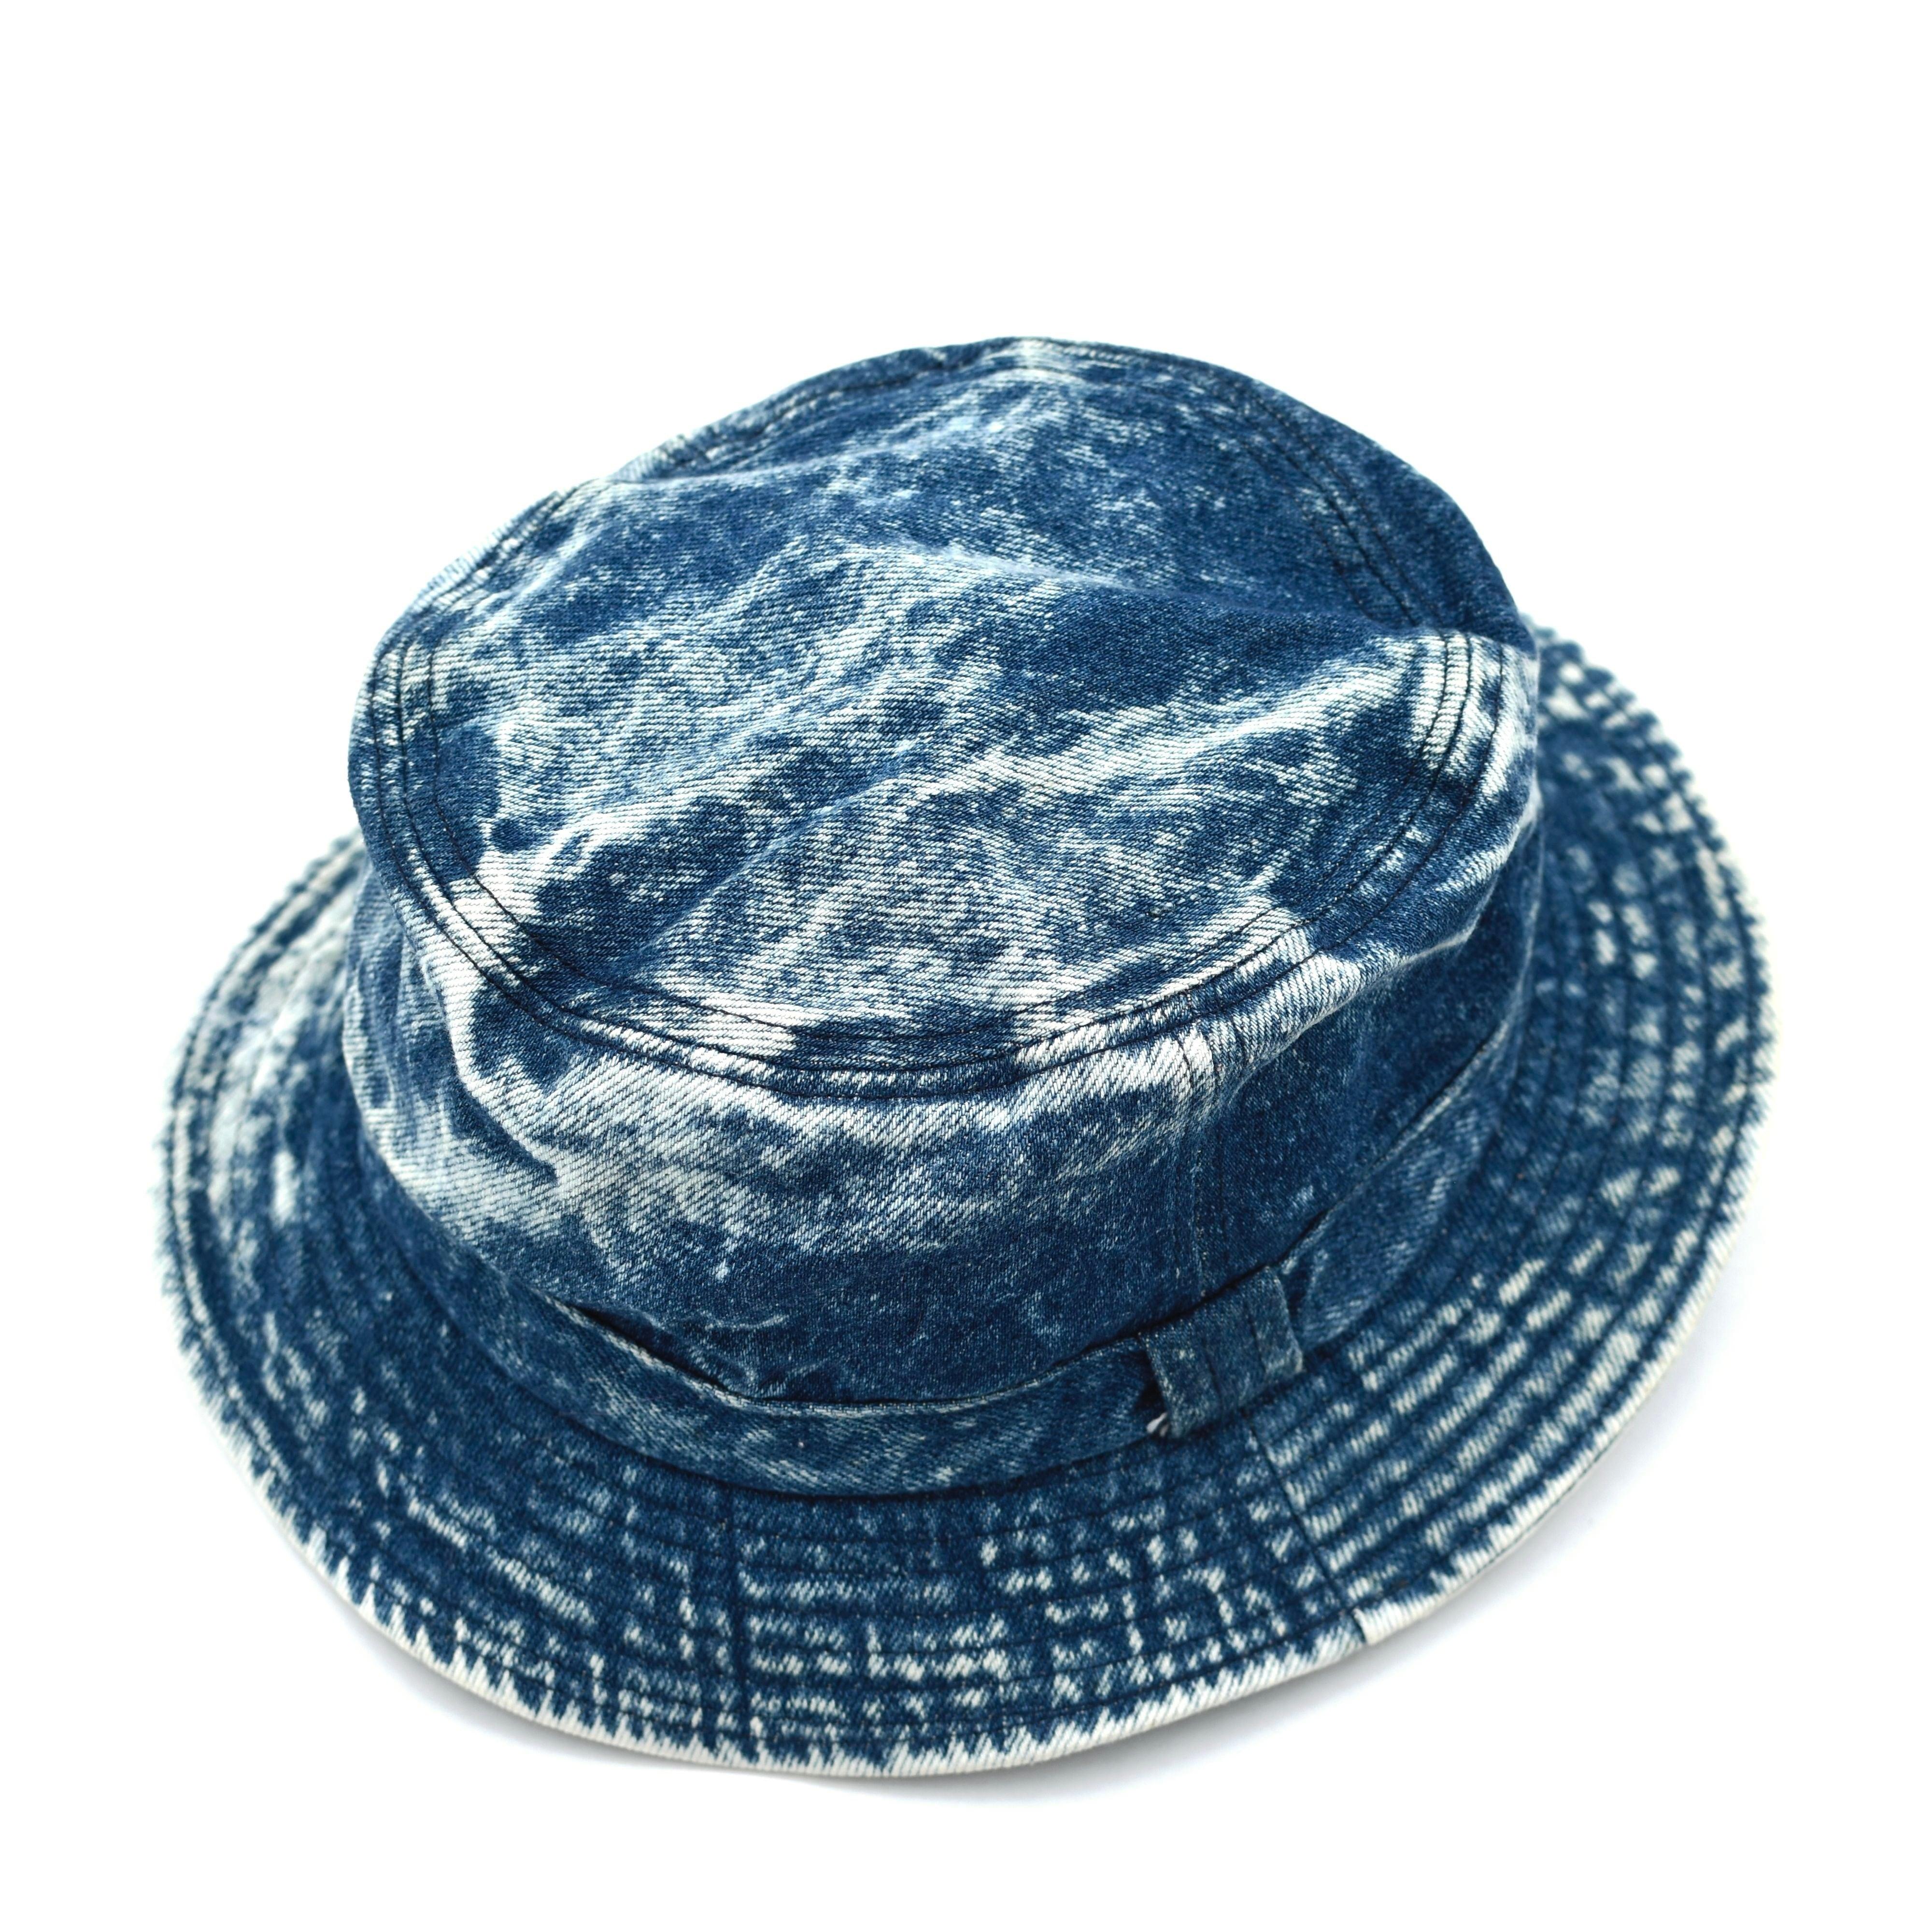 Chemical wash denim bucket hat